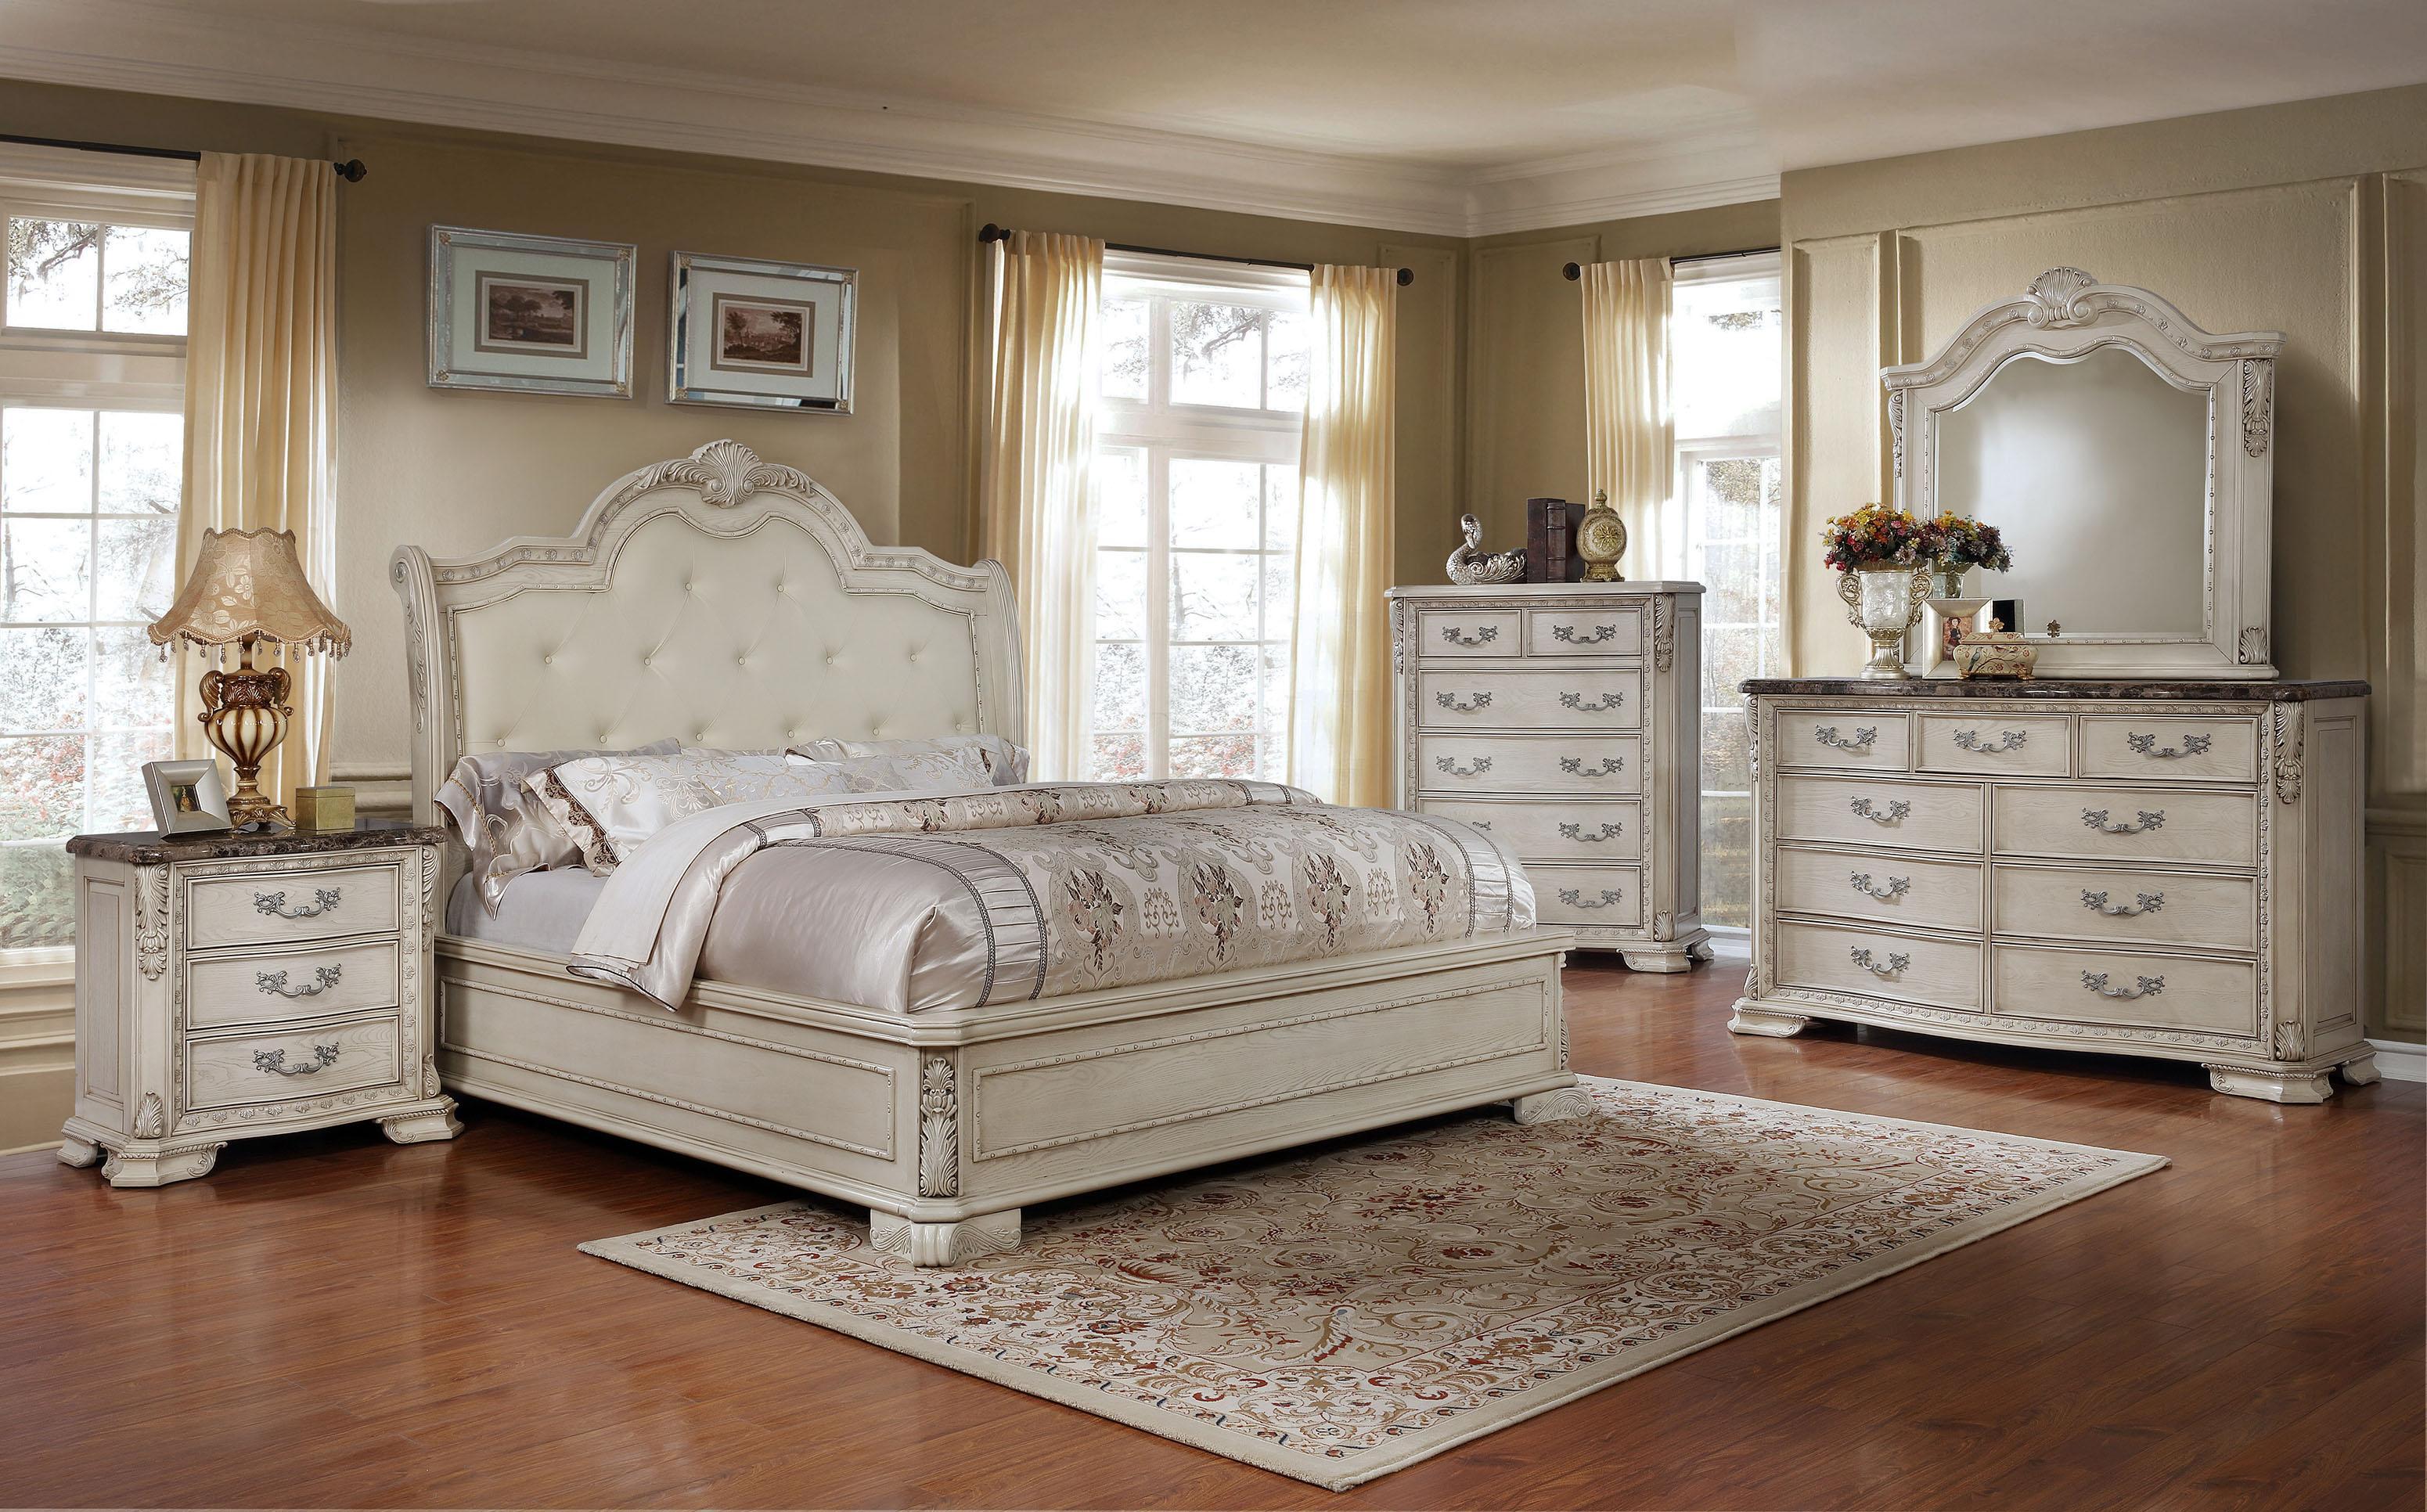 antique white tufted king size bedroom set 5pcs traditional mcferran b1000 (b1000-ek-set-5) buy